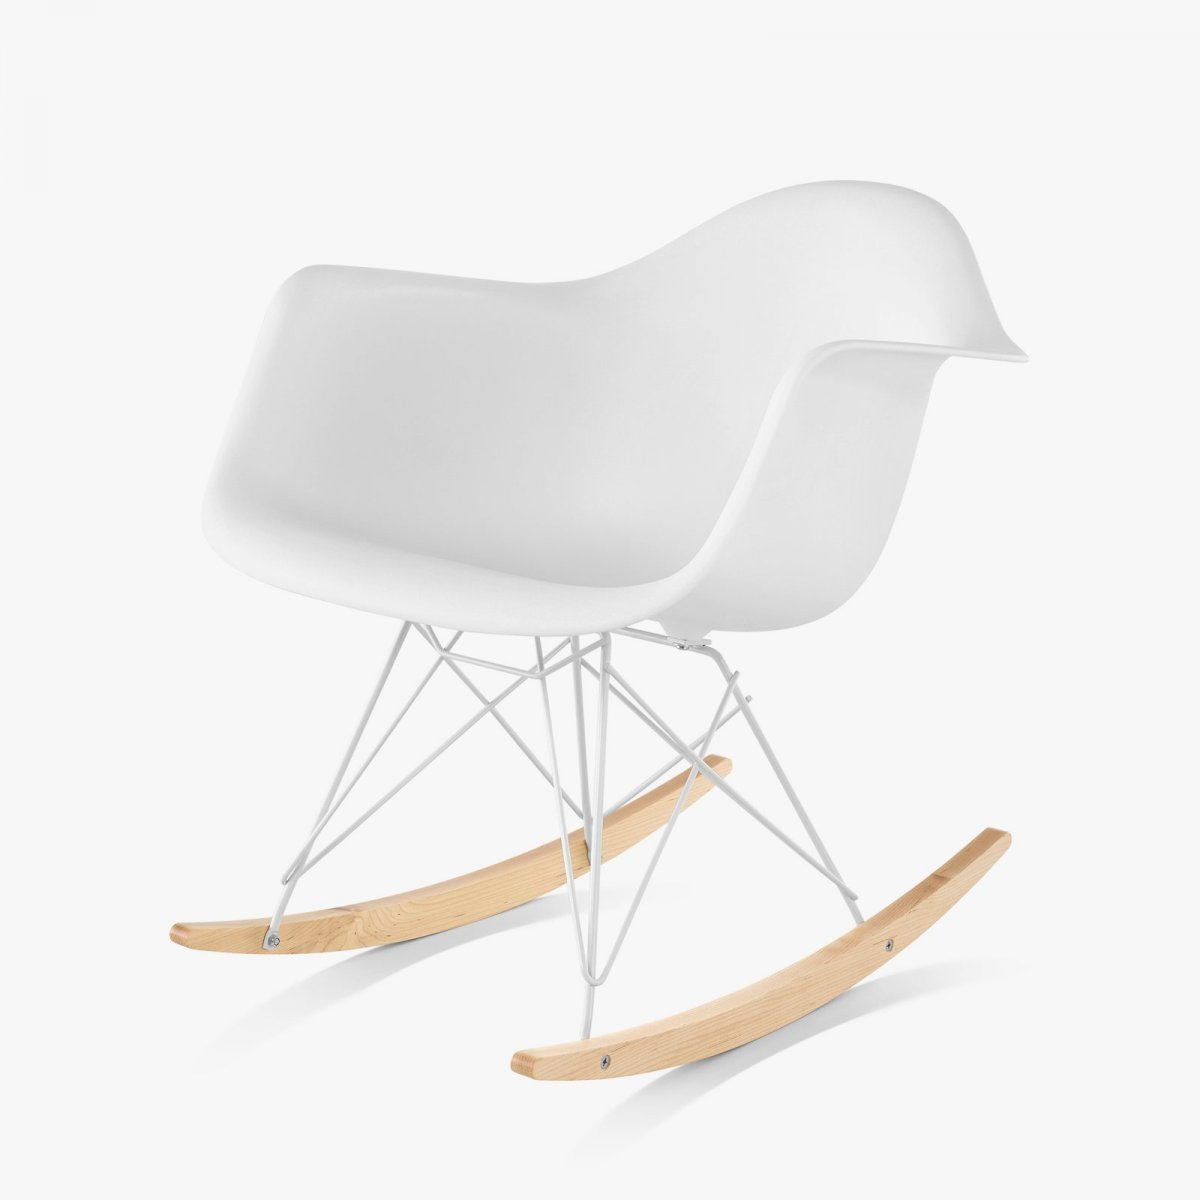 Eames Molded Plastic Armchair Rocker Base, white.